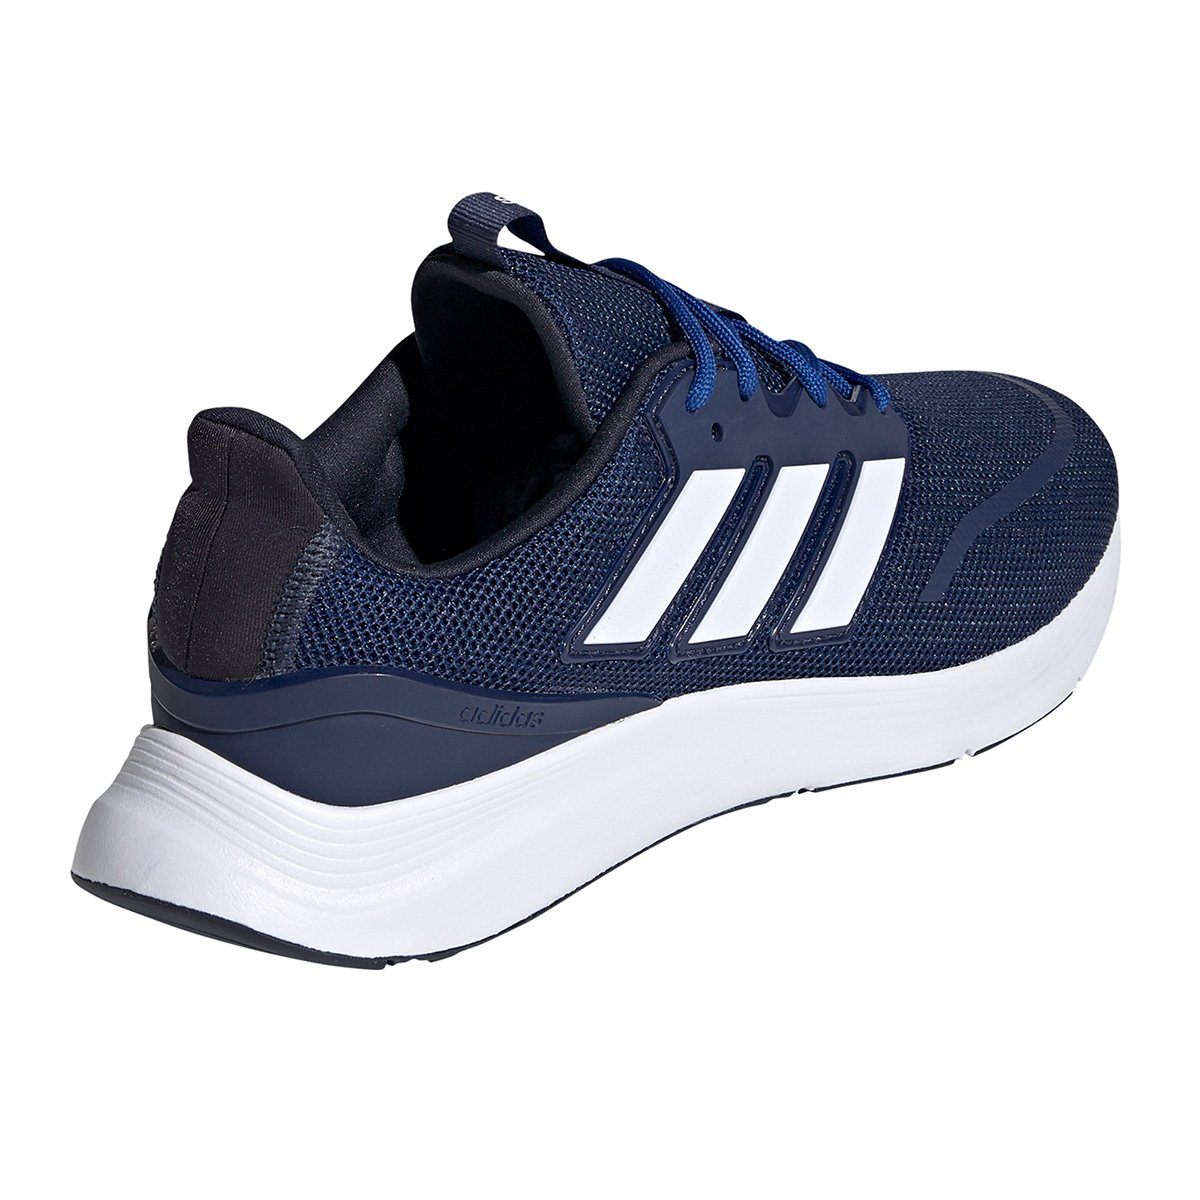 Tenis Esporte Adidas Energy Falcon